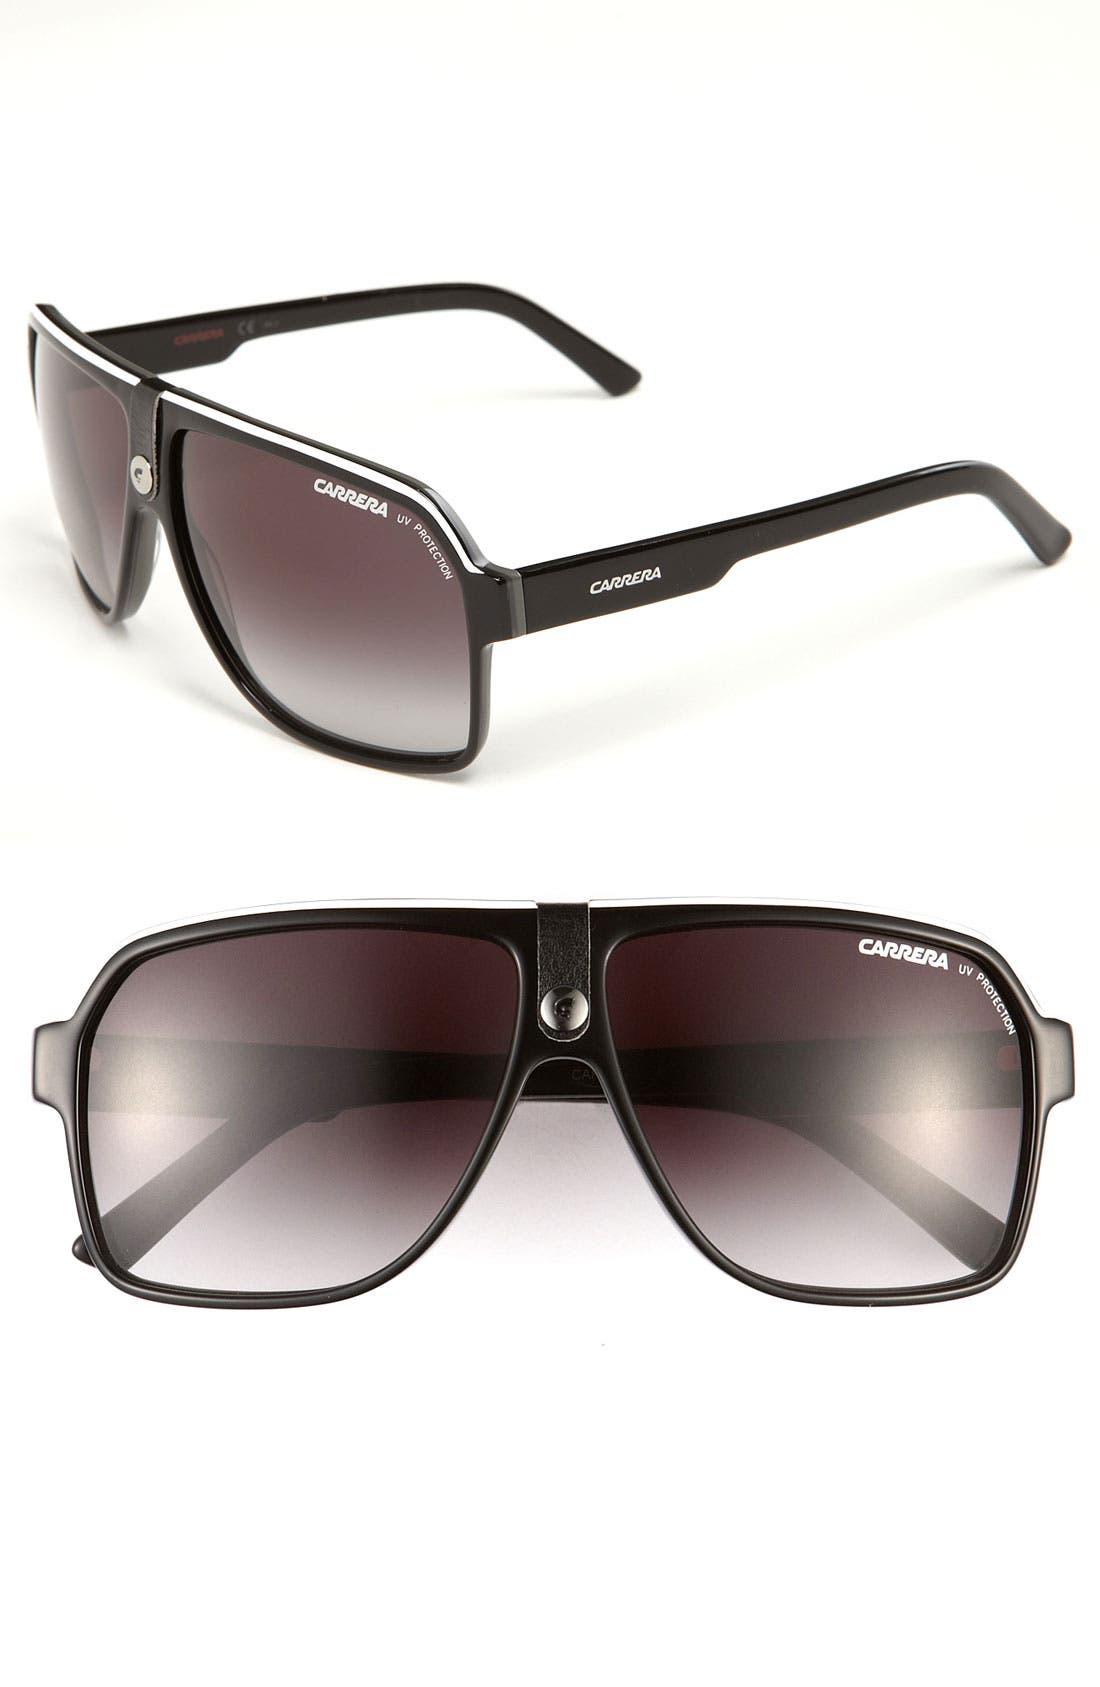 Carrera Eyewear 62Mm Aviator Sunglasses - Black/ Grey